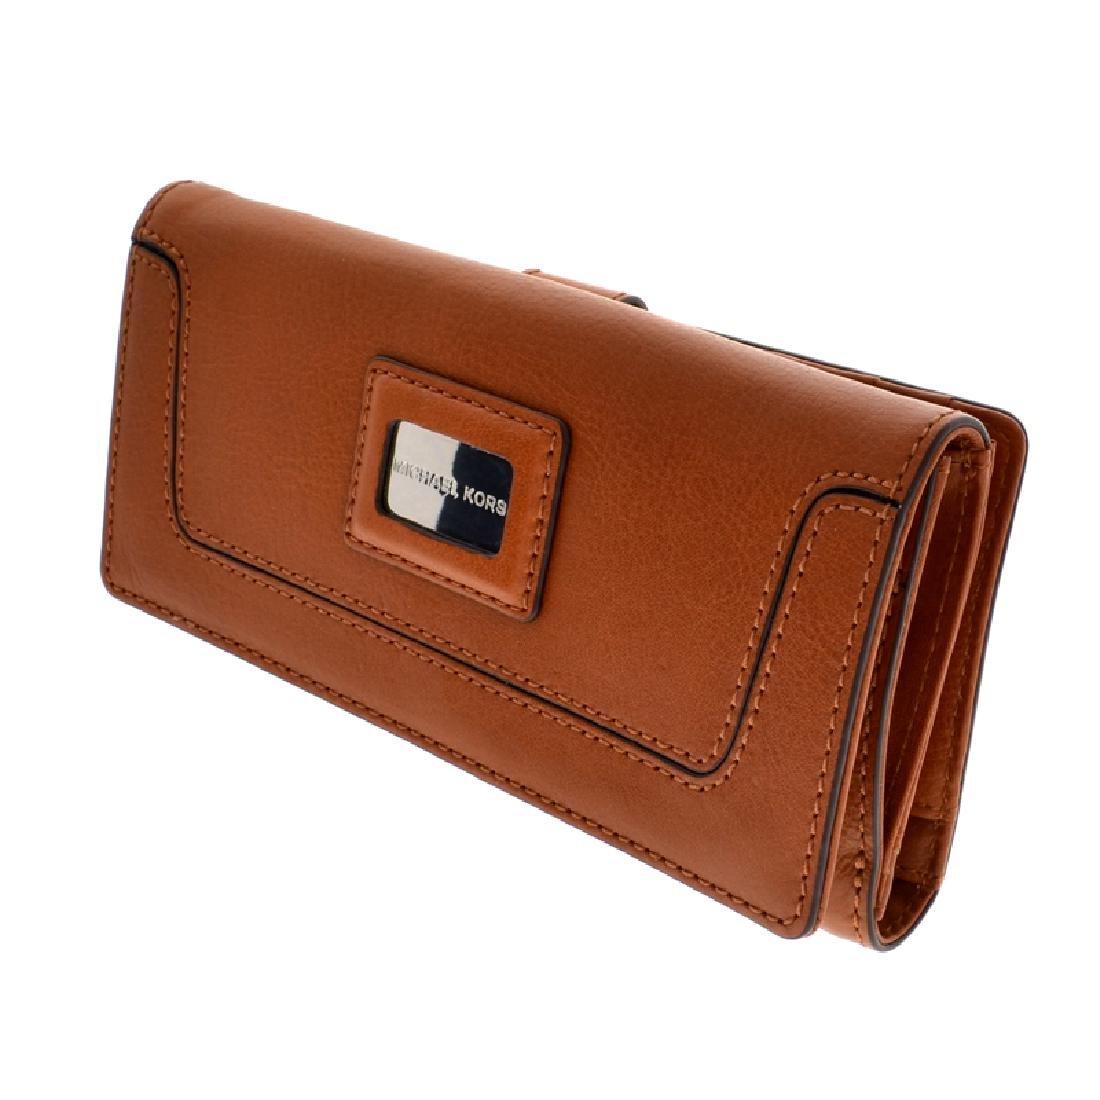 Brand New Michael Kors Brookville Luggage Carryall